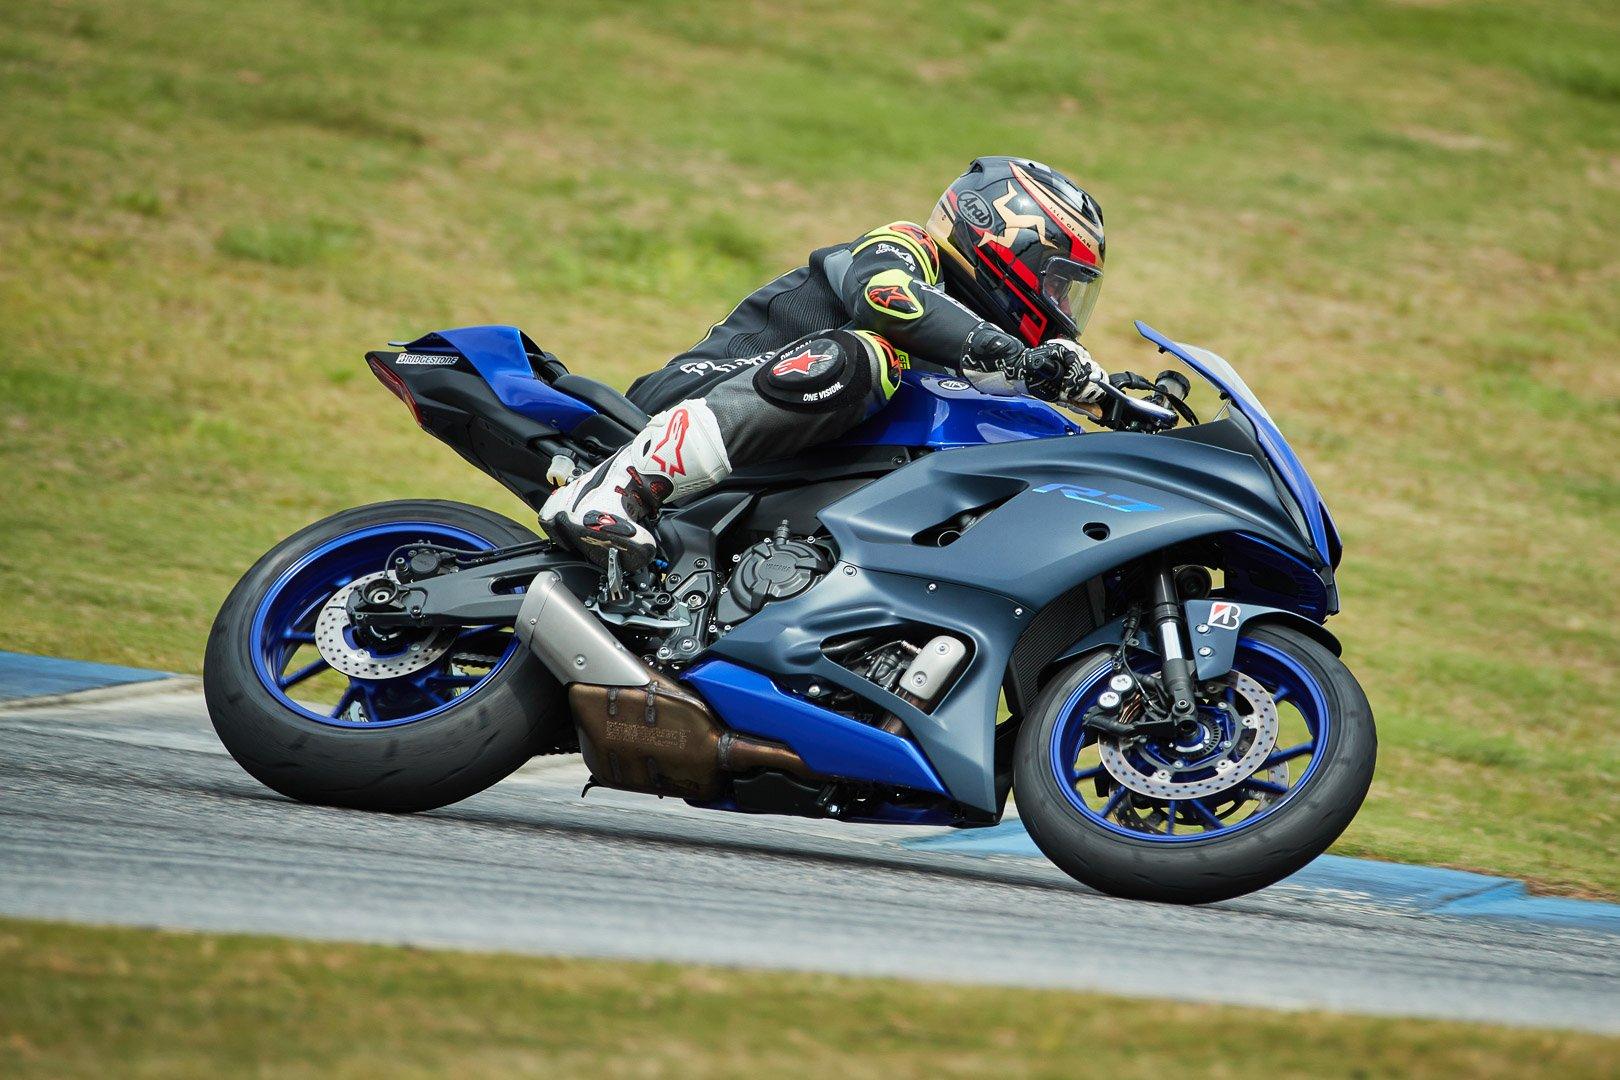 ultimatemotorcycling.com